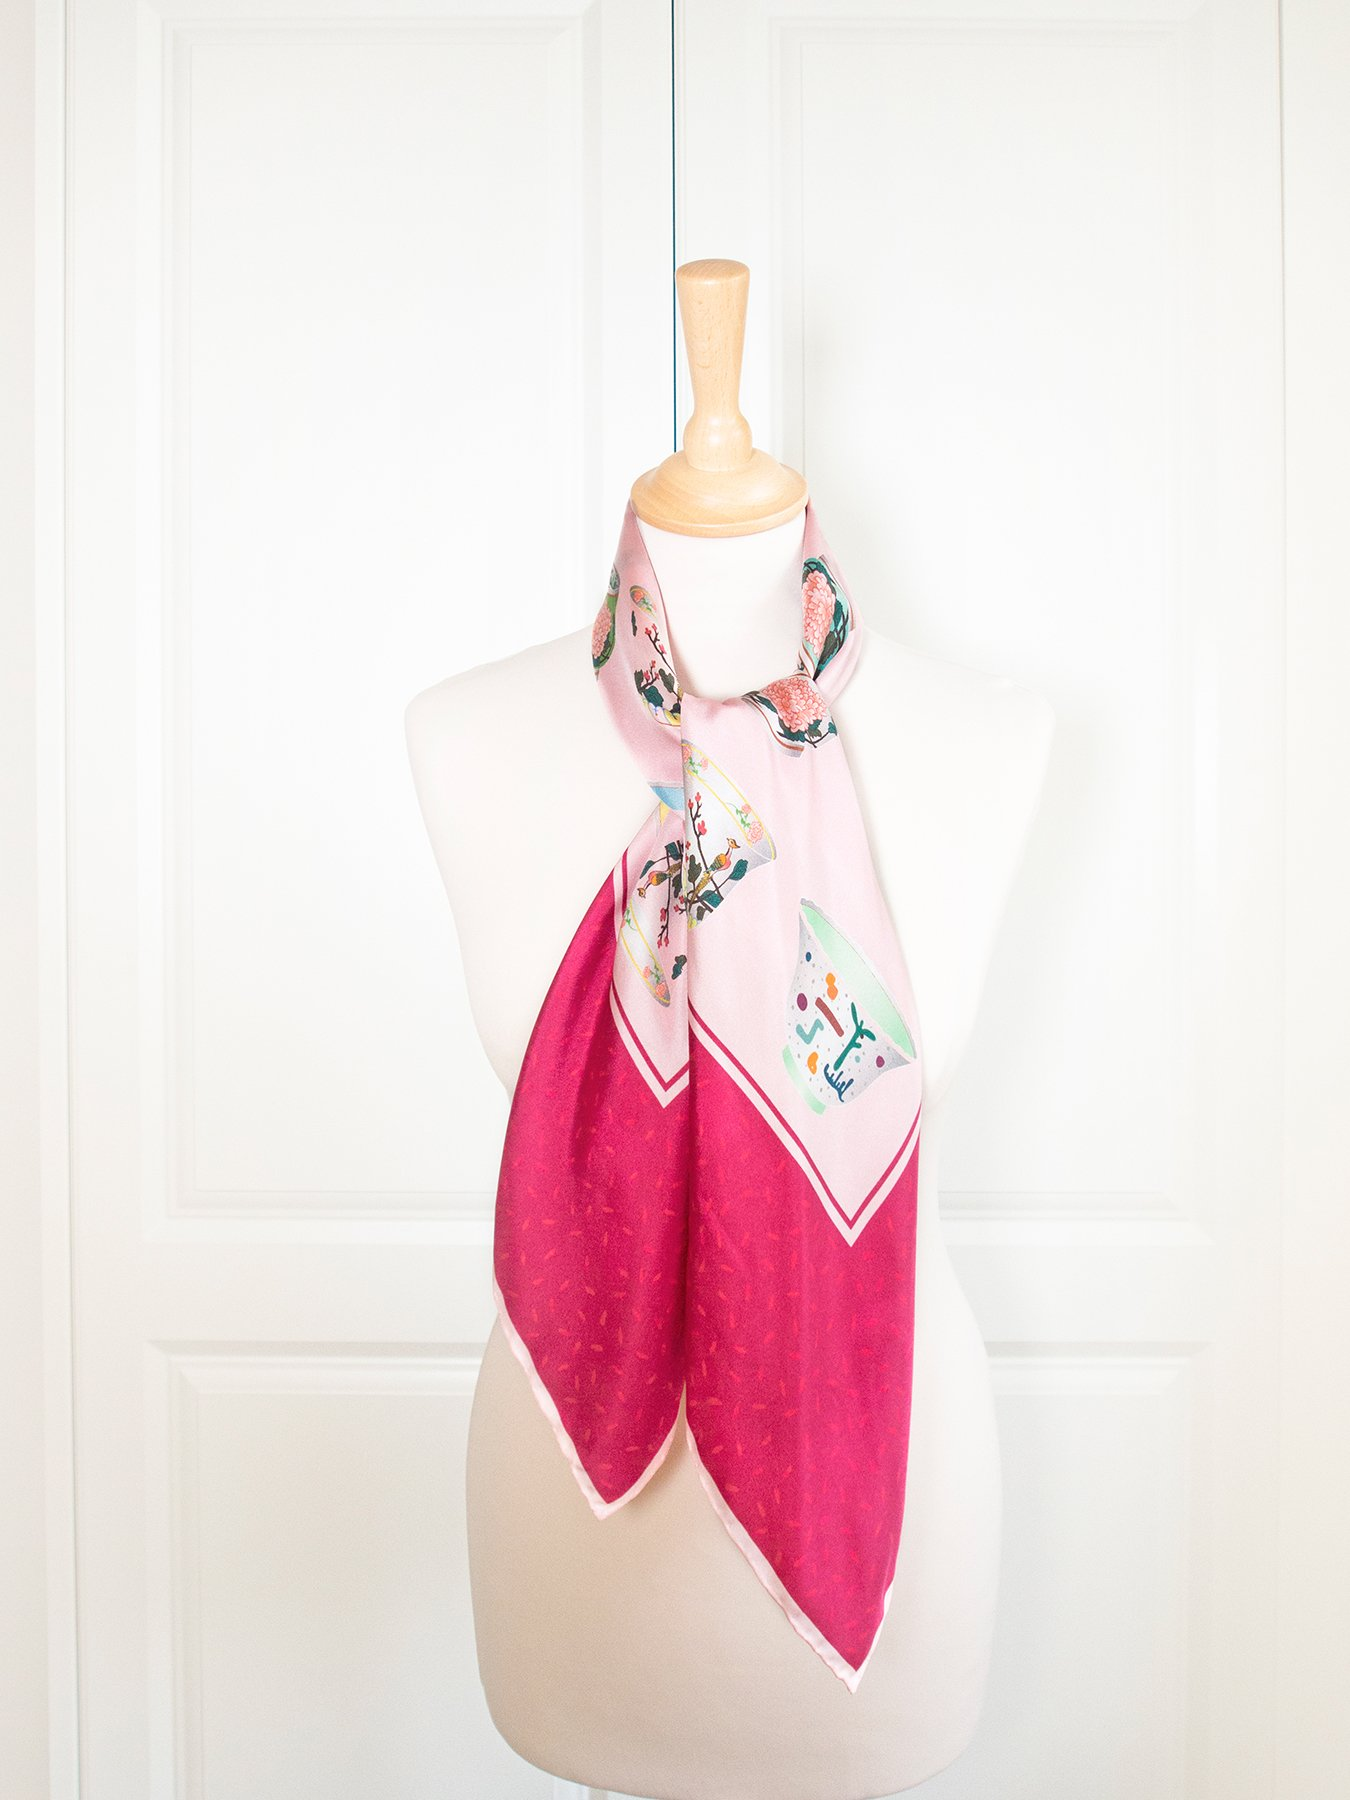 40 personalised Tribute scarves